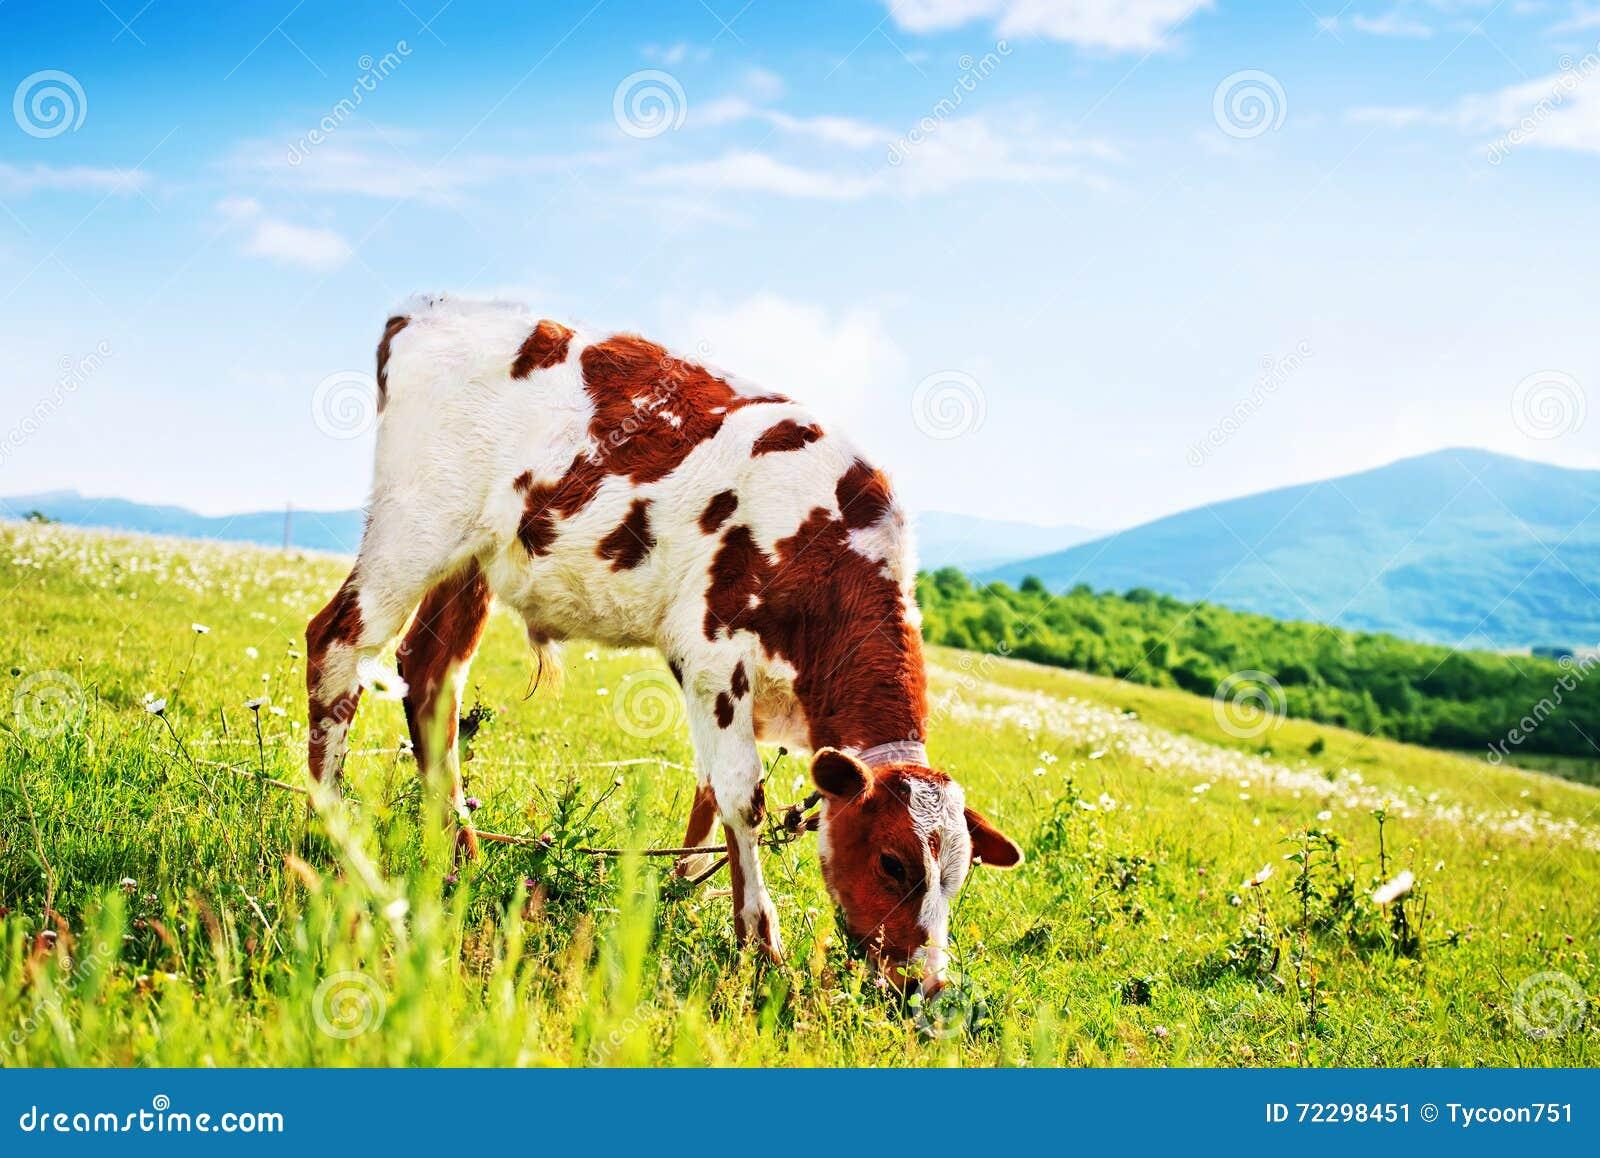 Download Природа стоковое изображение. изображение насчитывающей громоздкого - 72298451